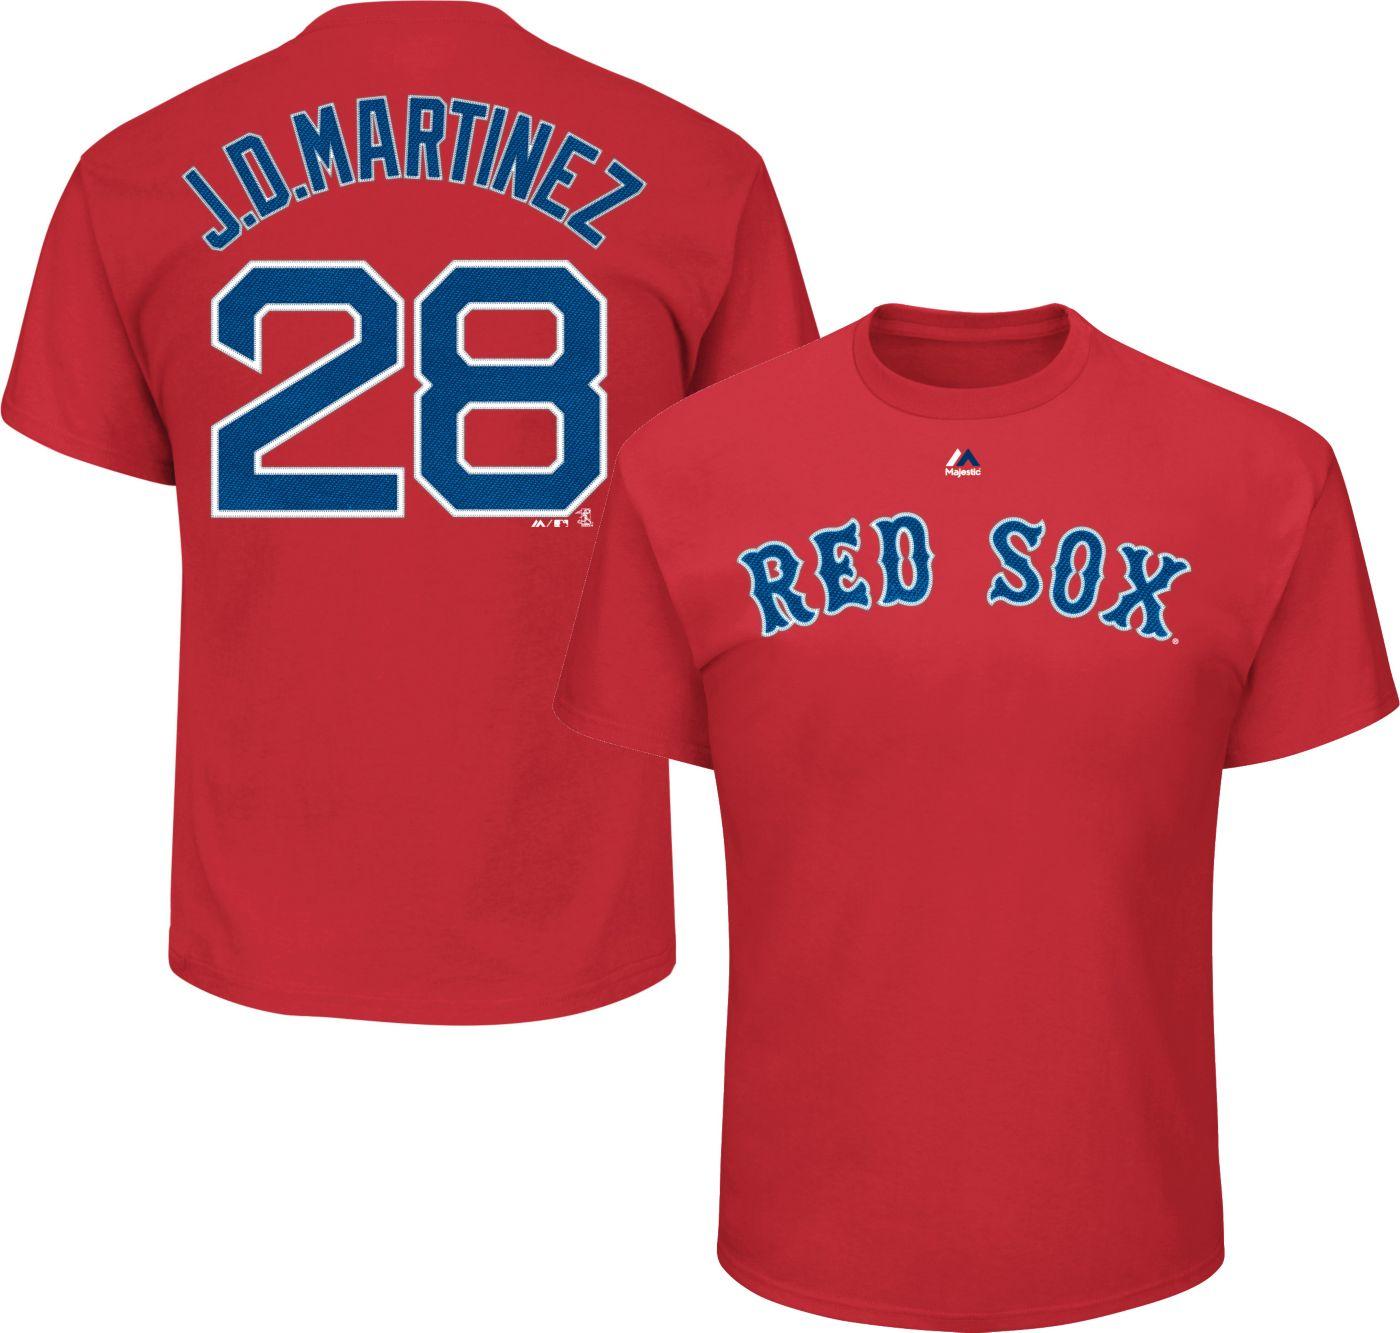 Majestic Men's Boston Red Sox J.D. Martinez #28 Red T-Shirt